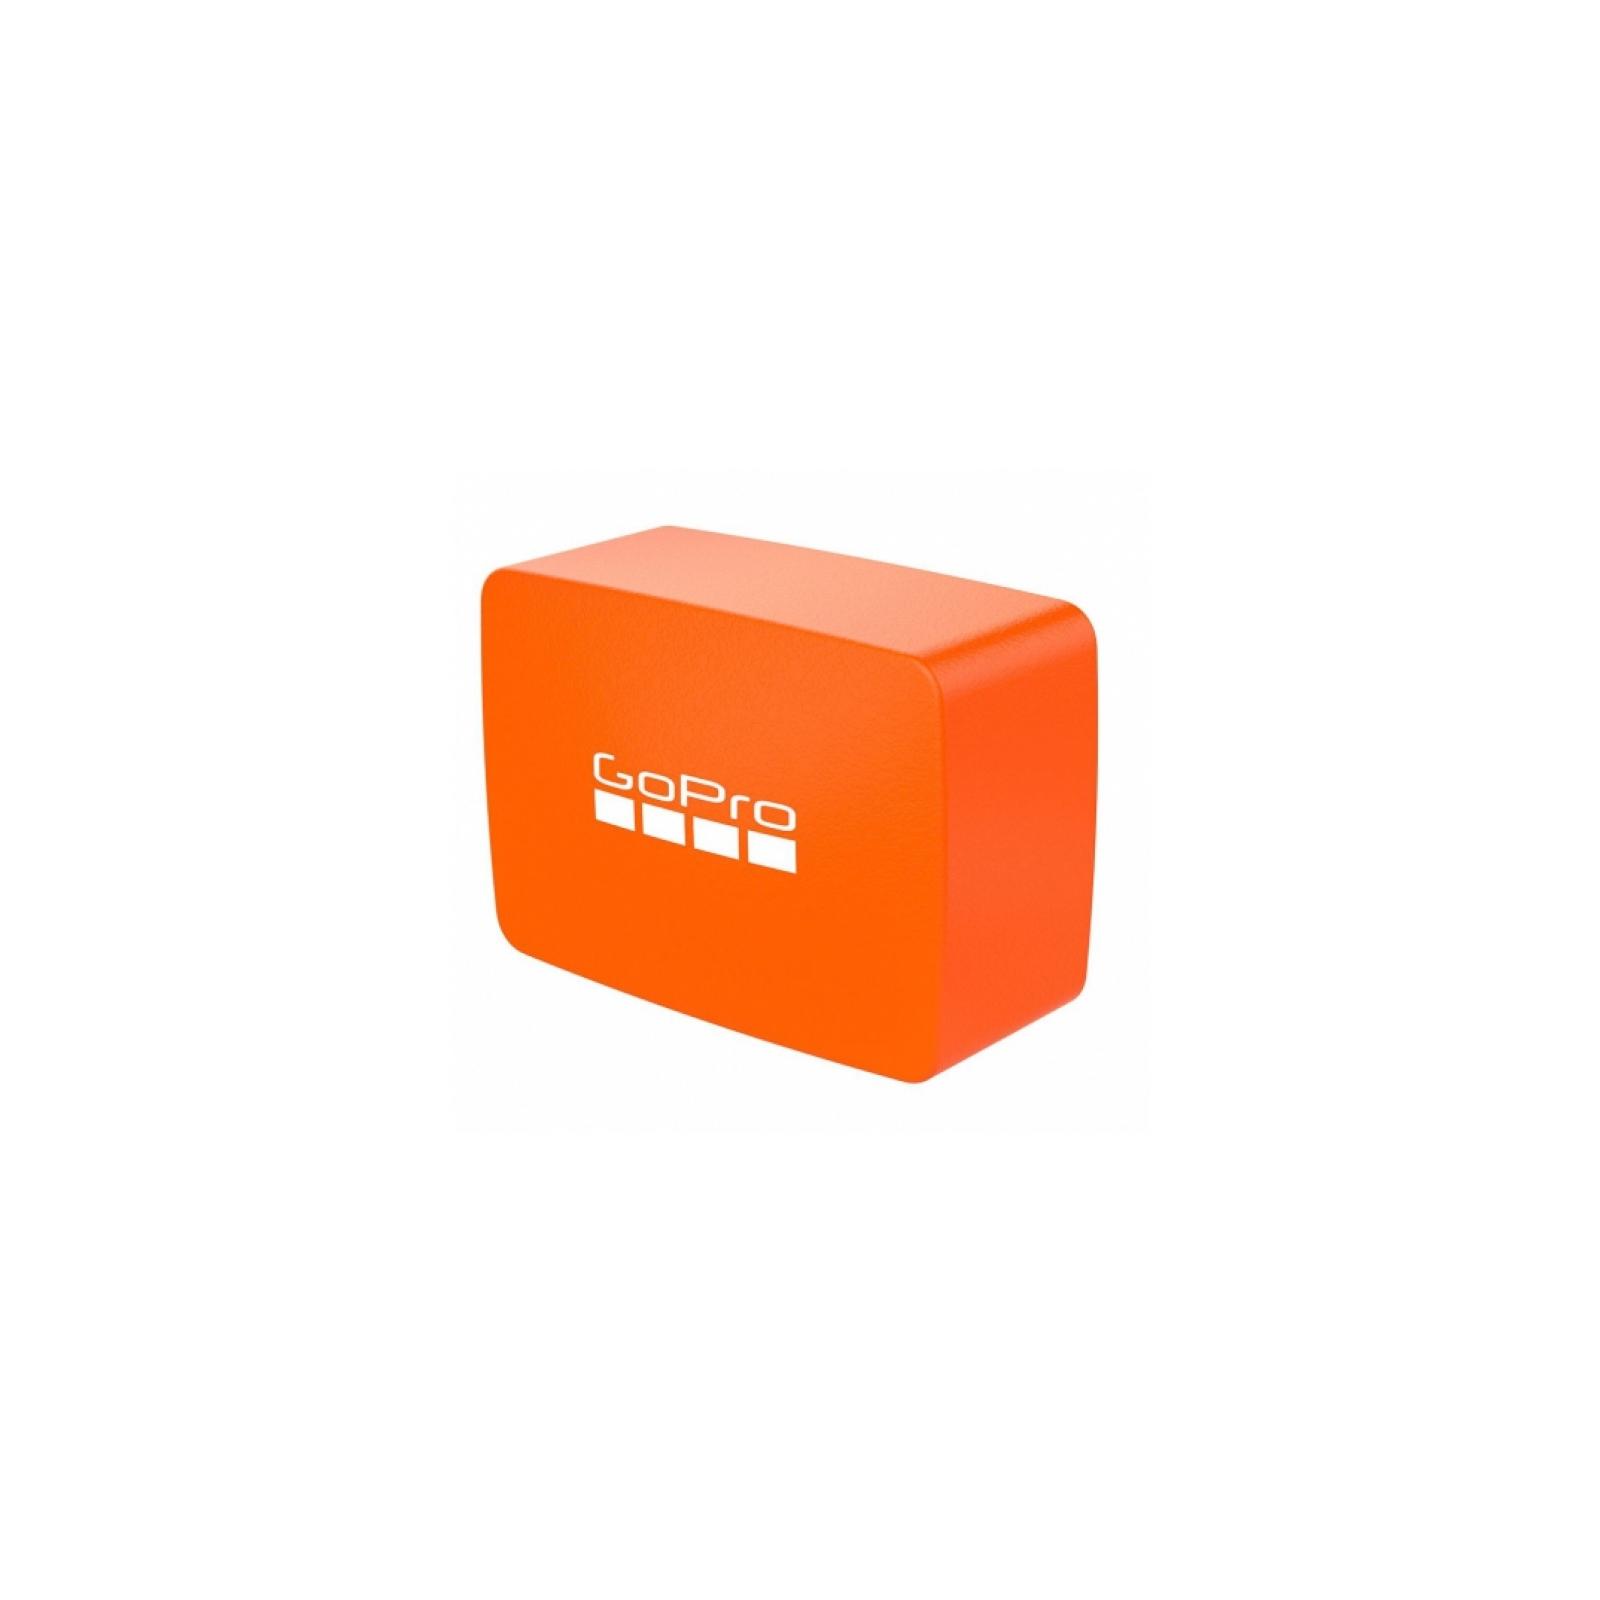 Аксессуар к экшн-камерам GoPro Floaty (AFLTY-004)